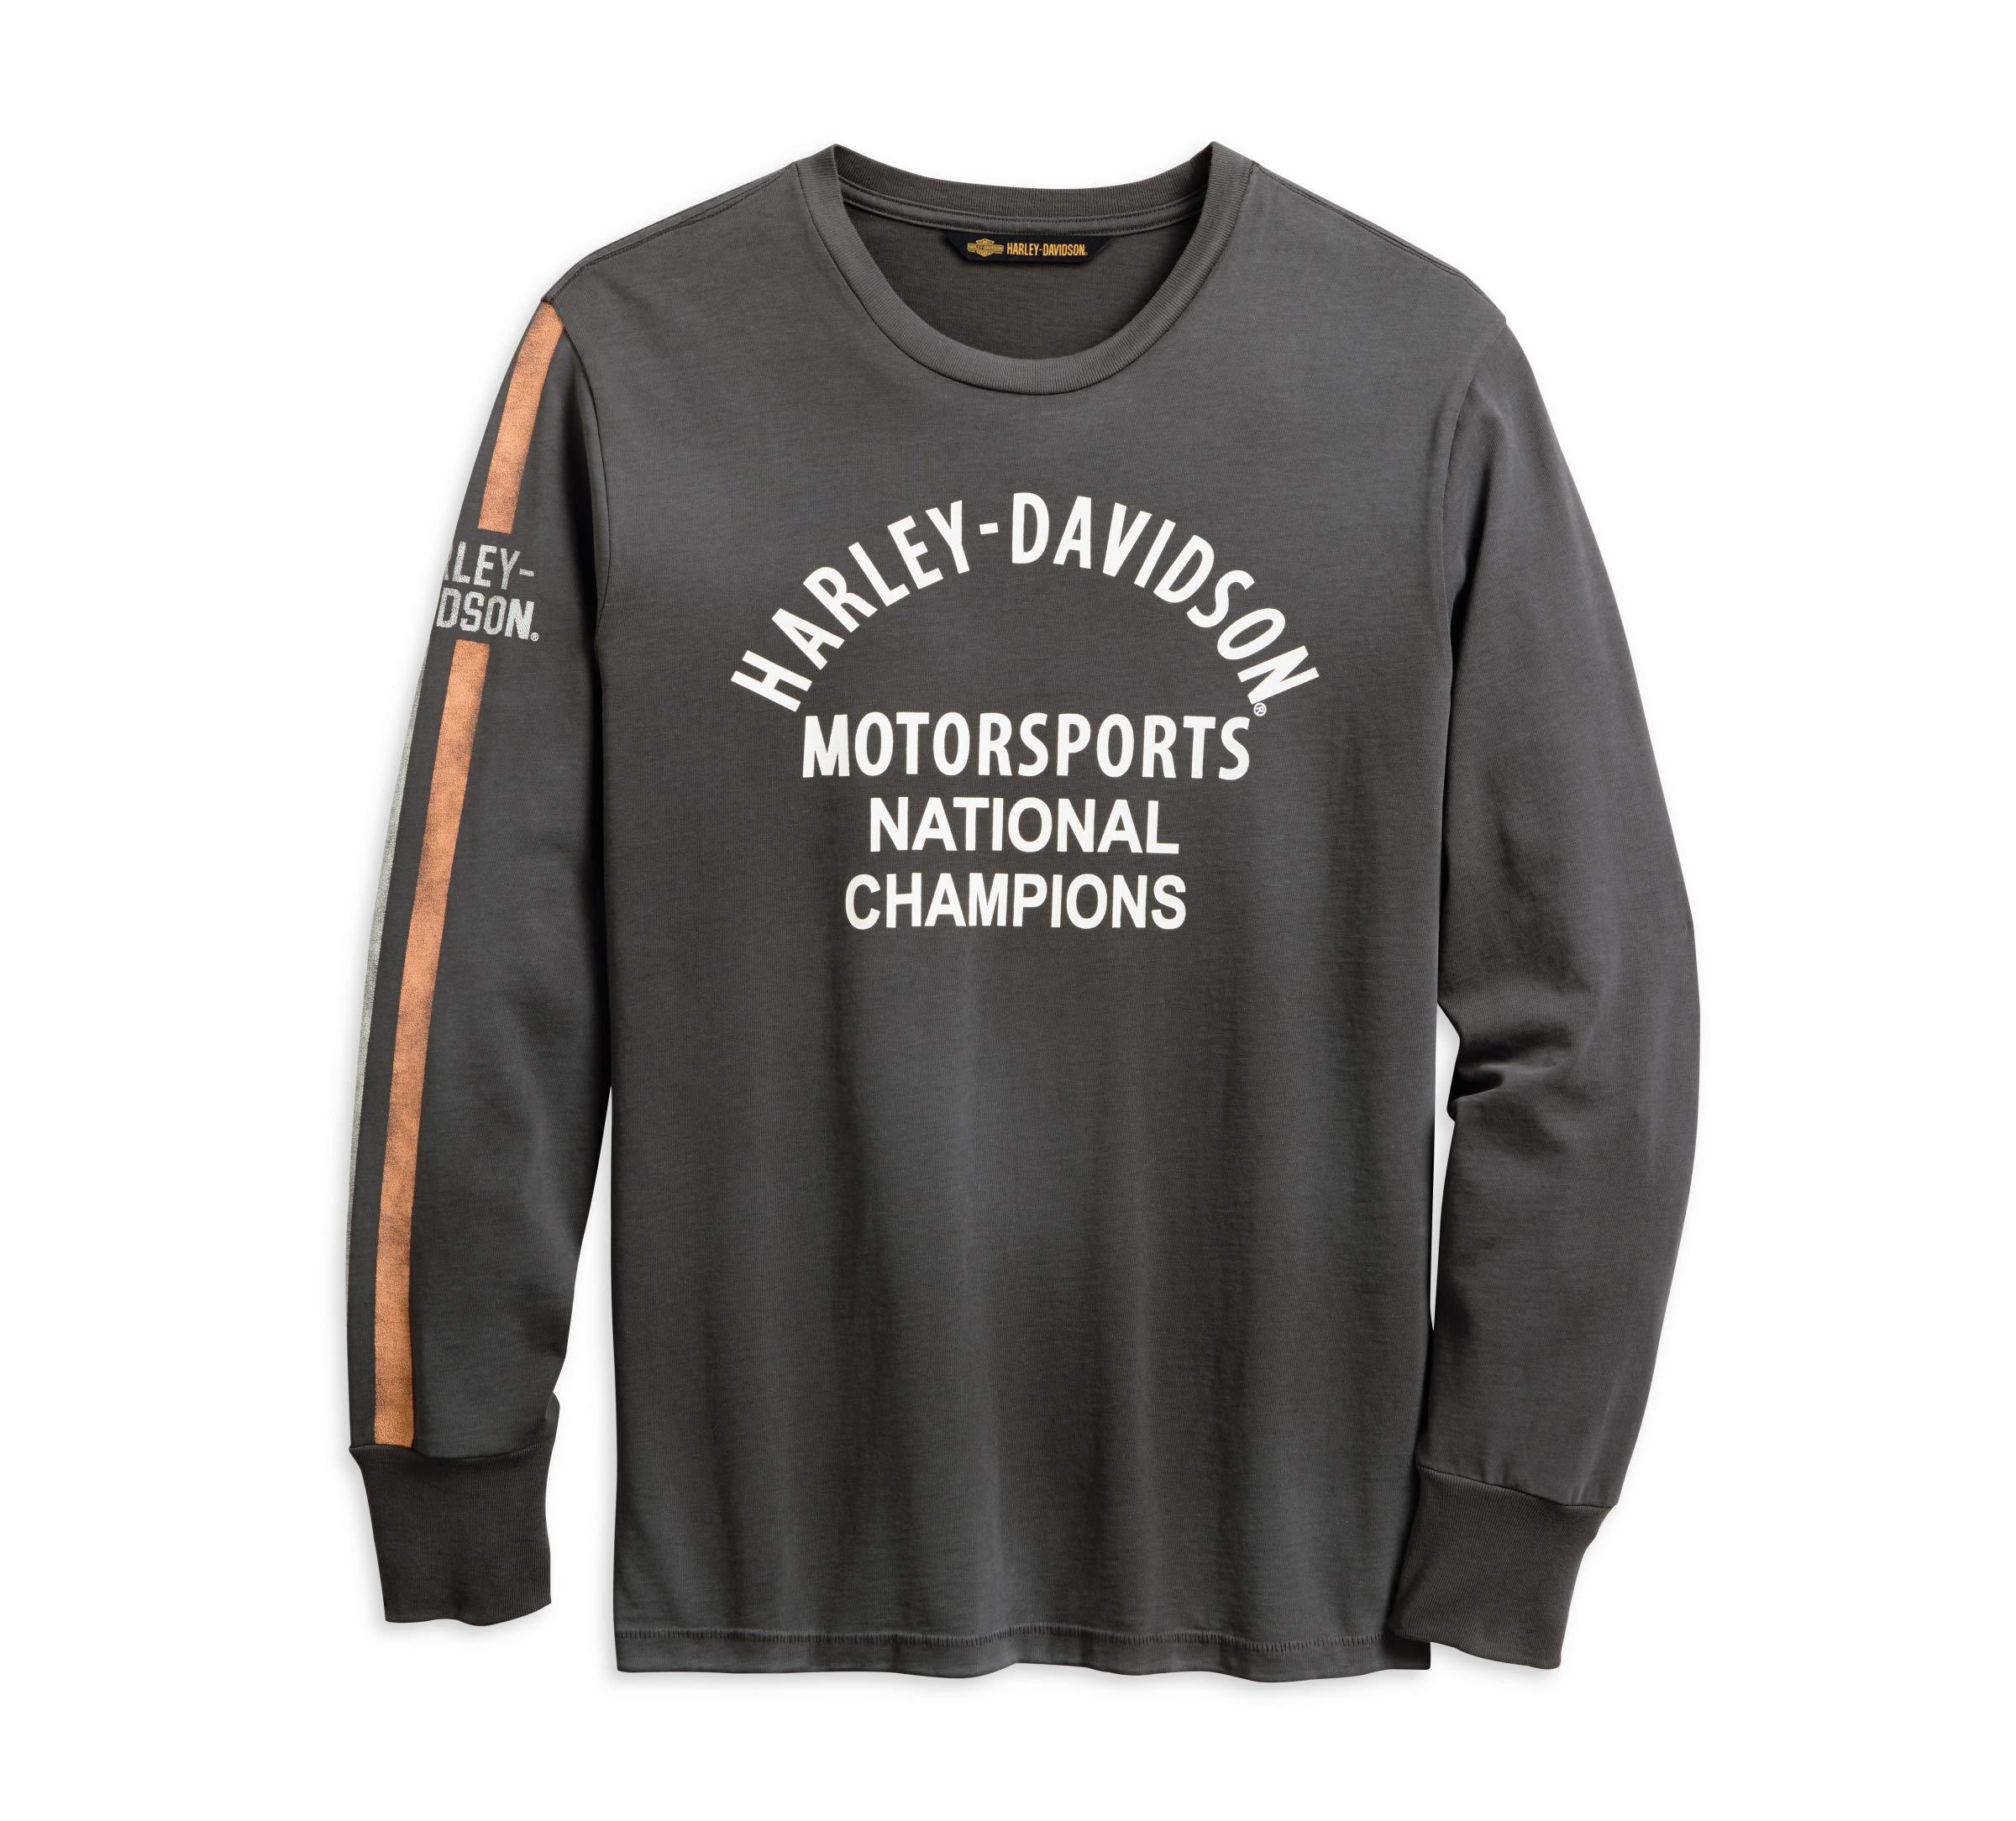 Harley-Davidson Men's Motorsports Sleeve Stripe Tee